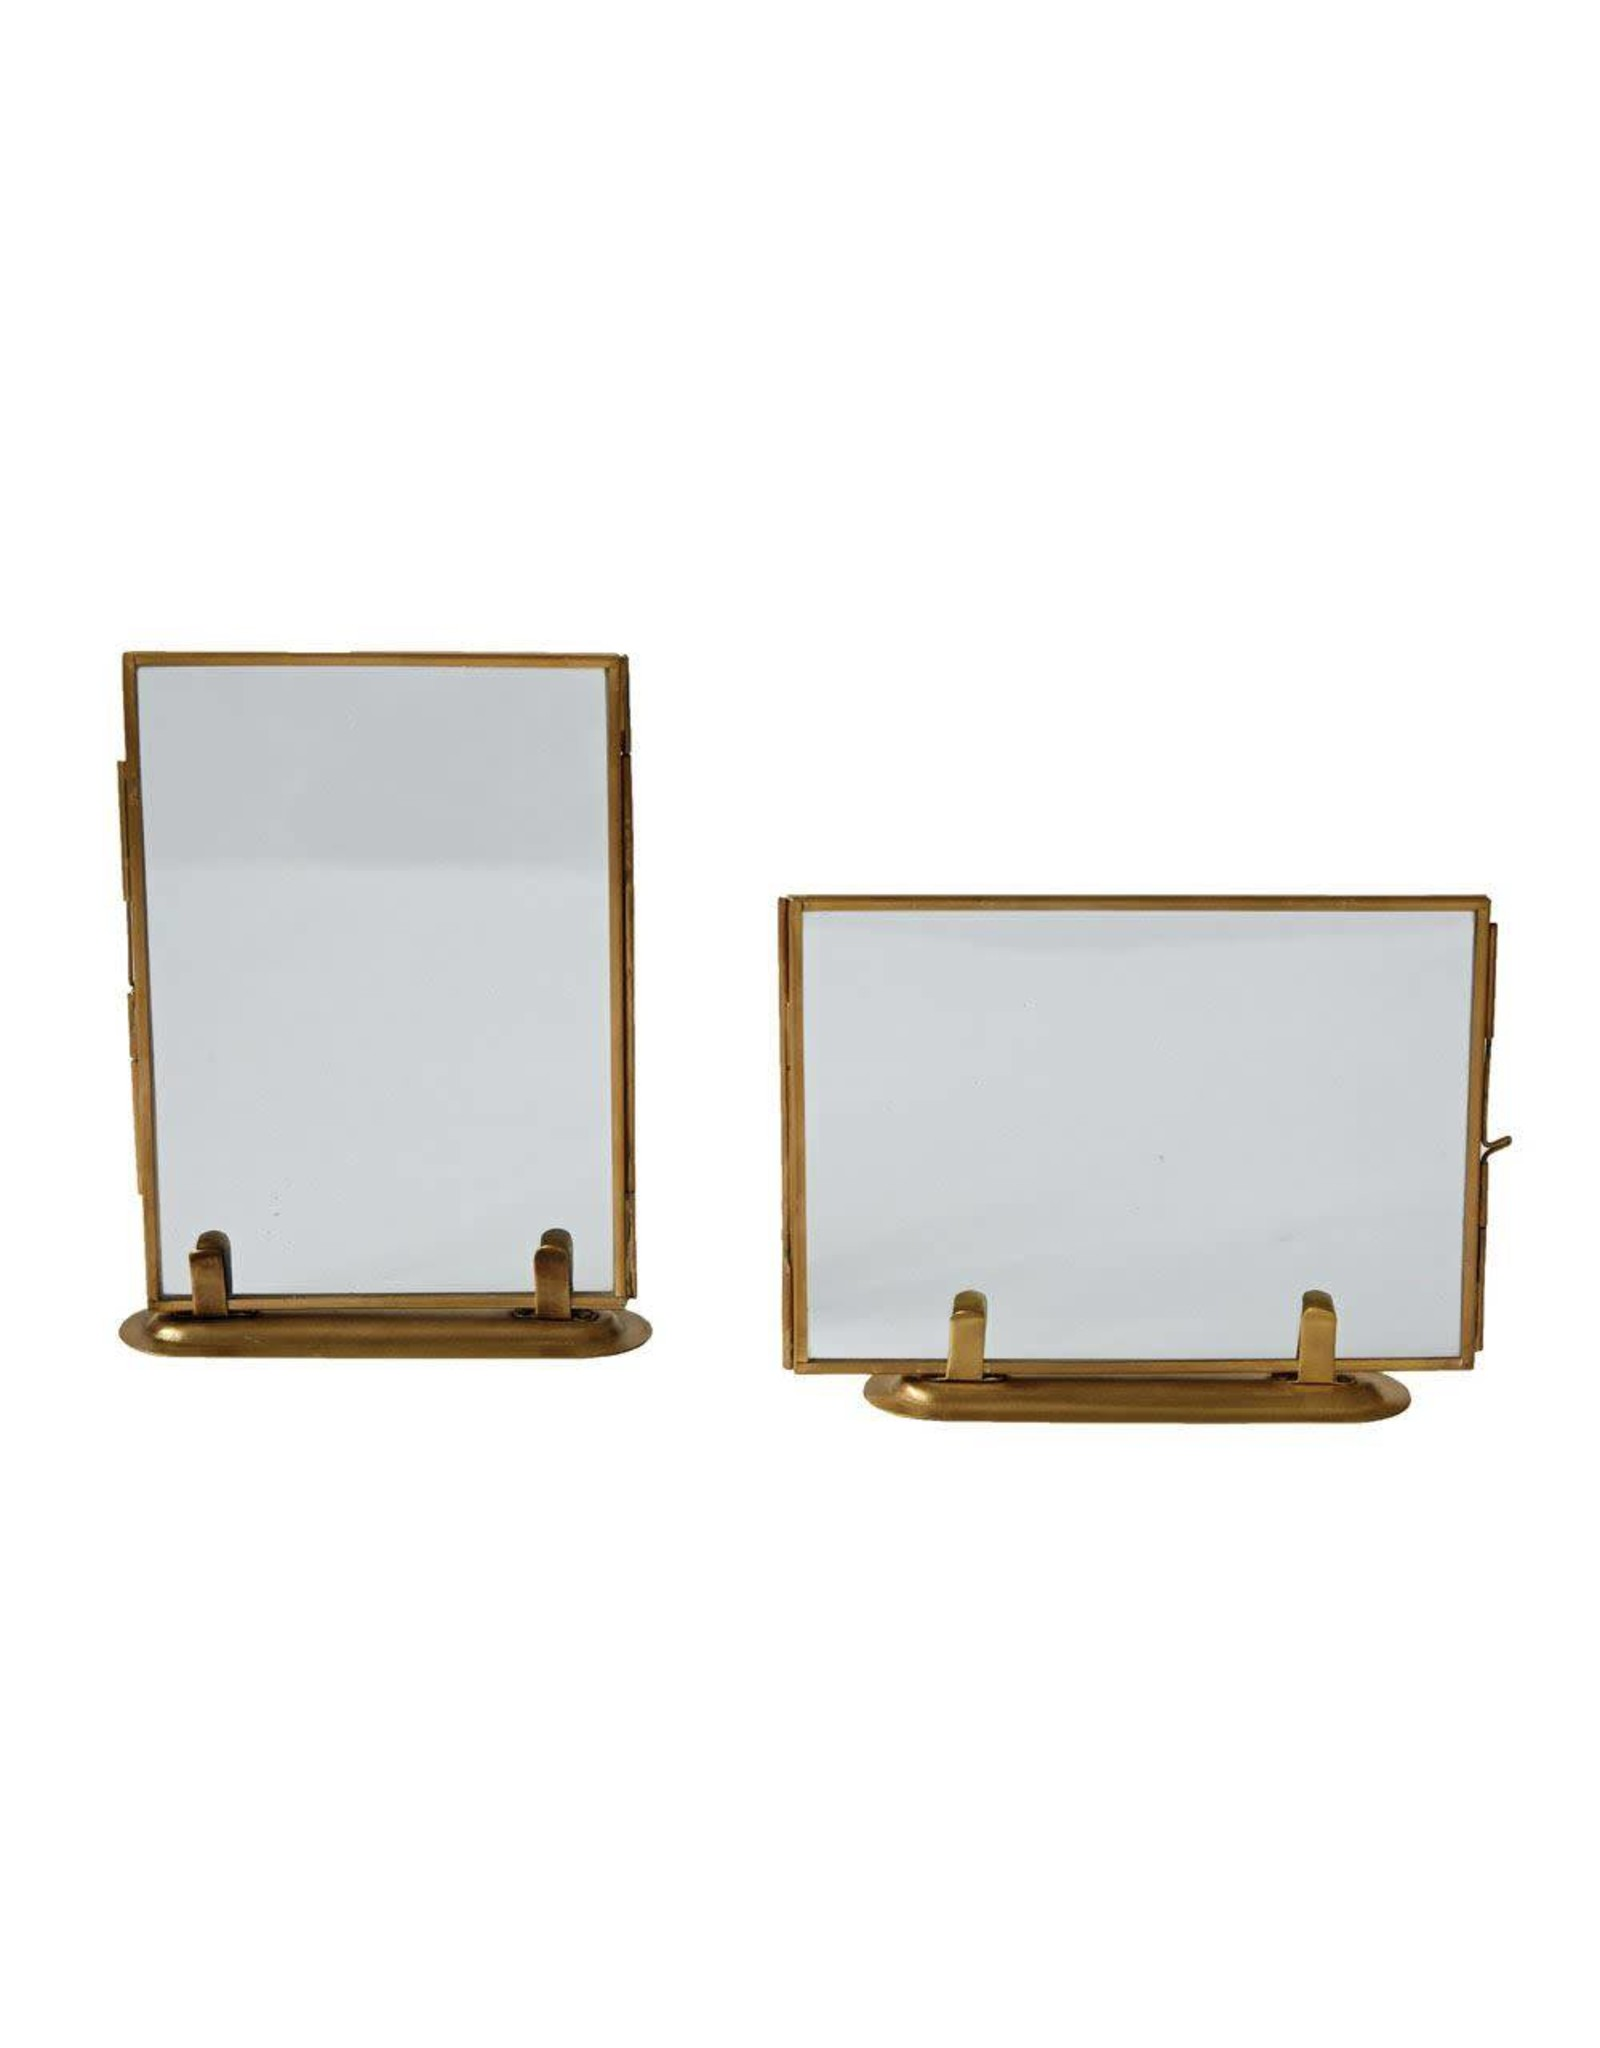 Brass Photo Frame - horizontal